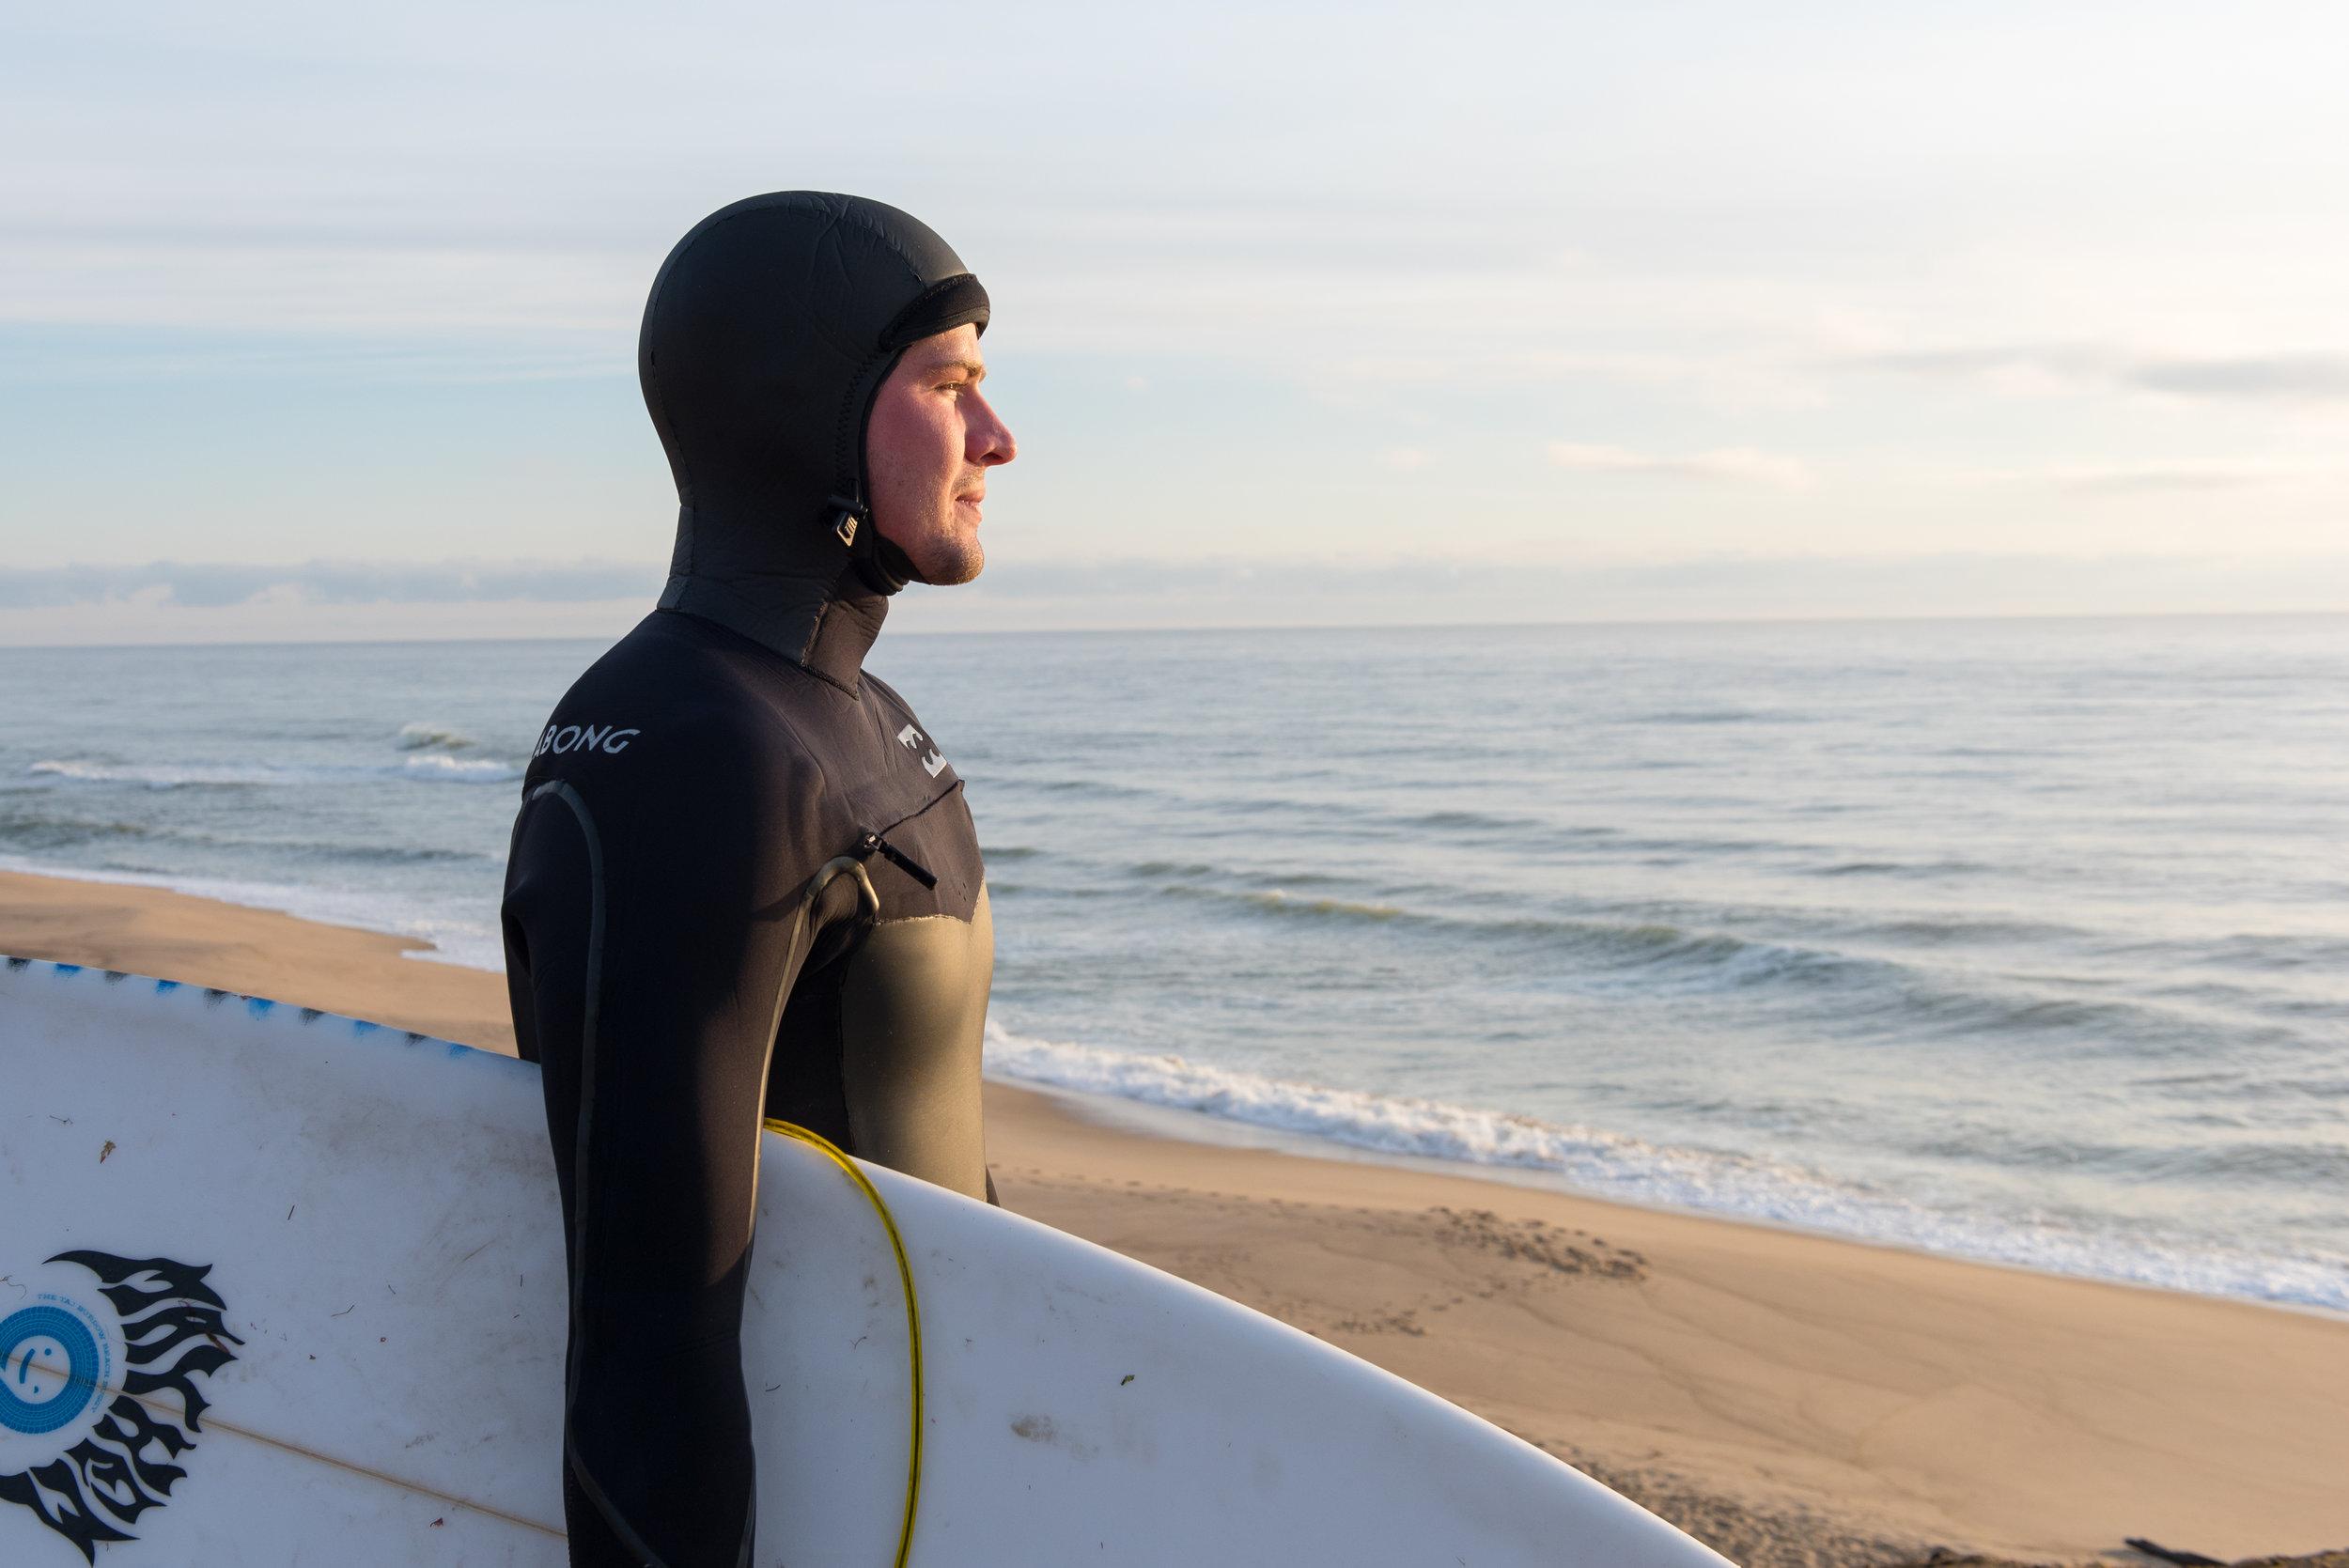 surfer_cape_cod_sunrise_swells.JPG